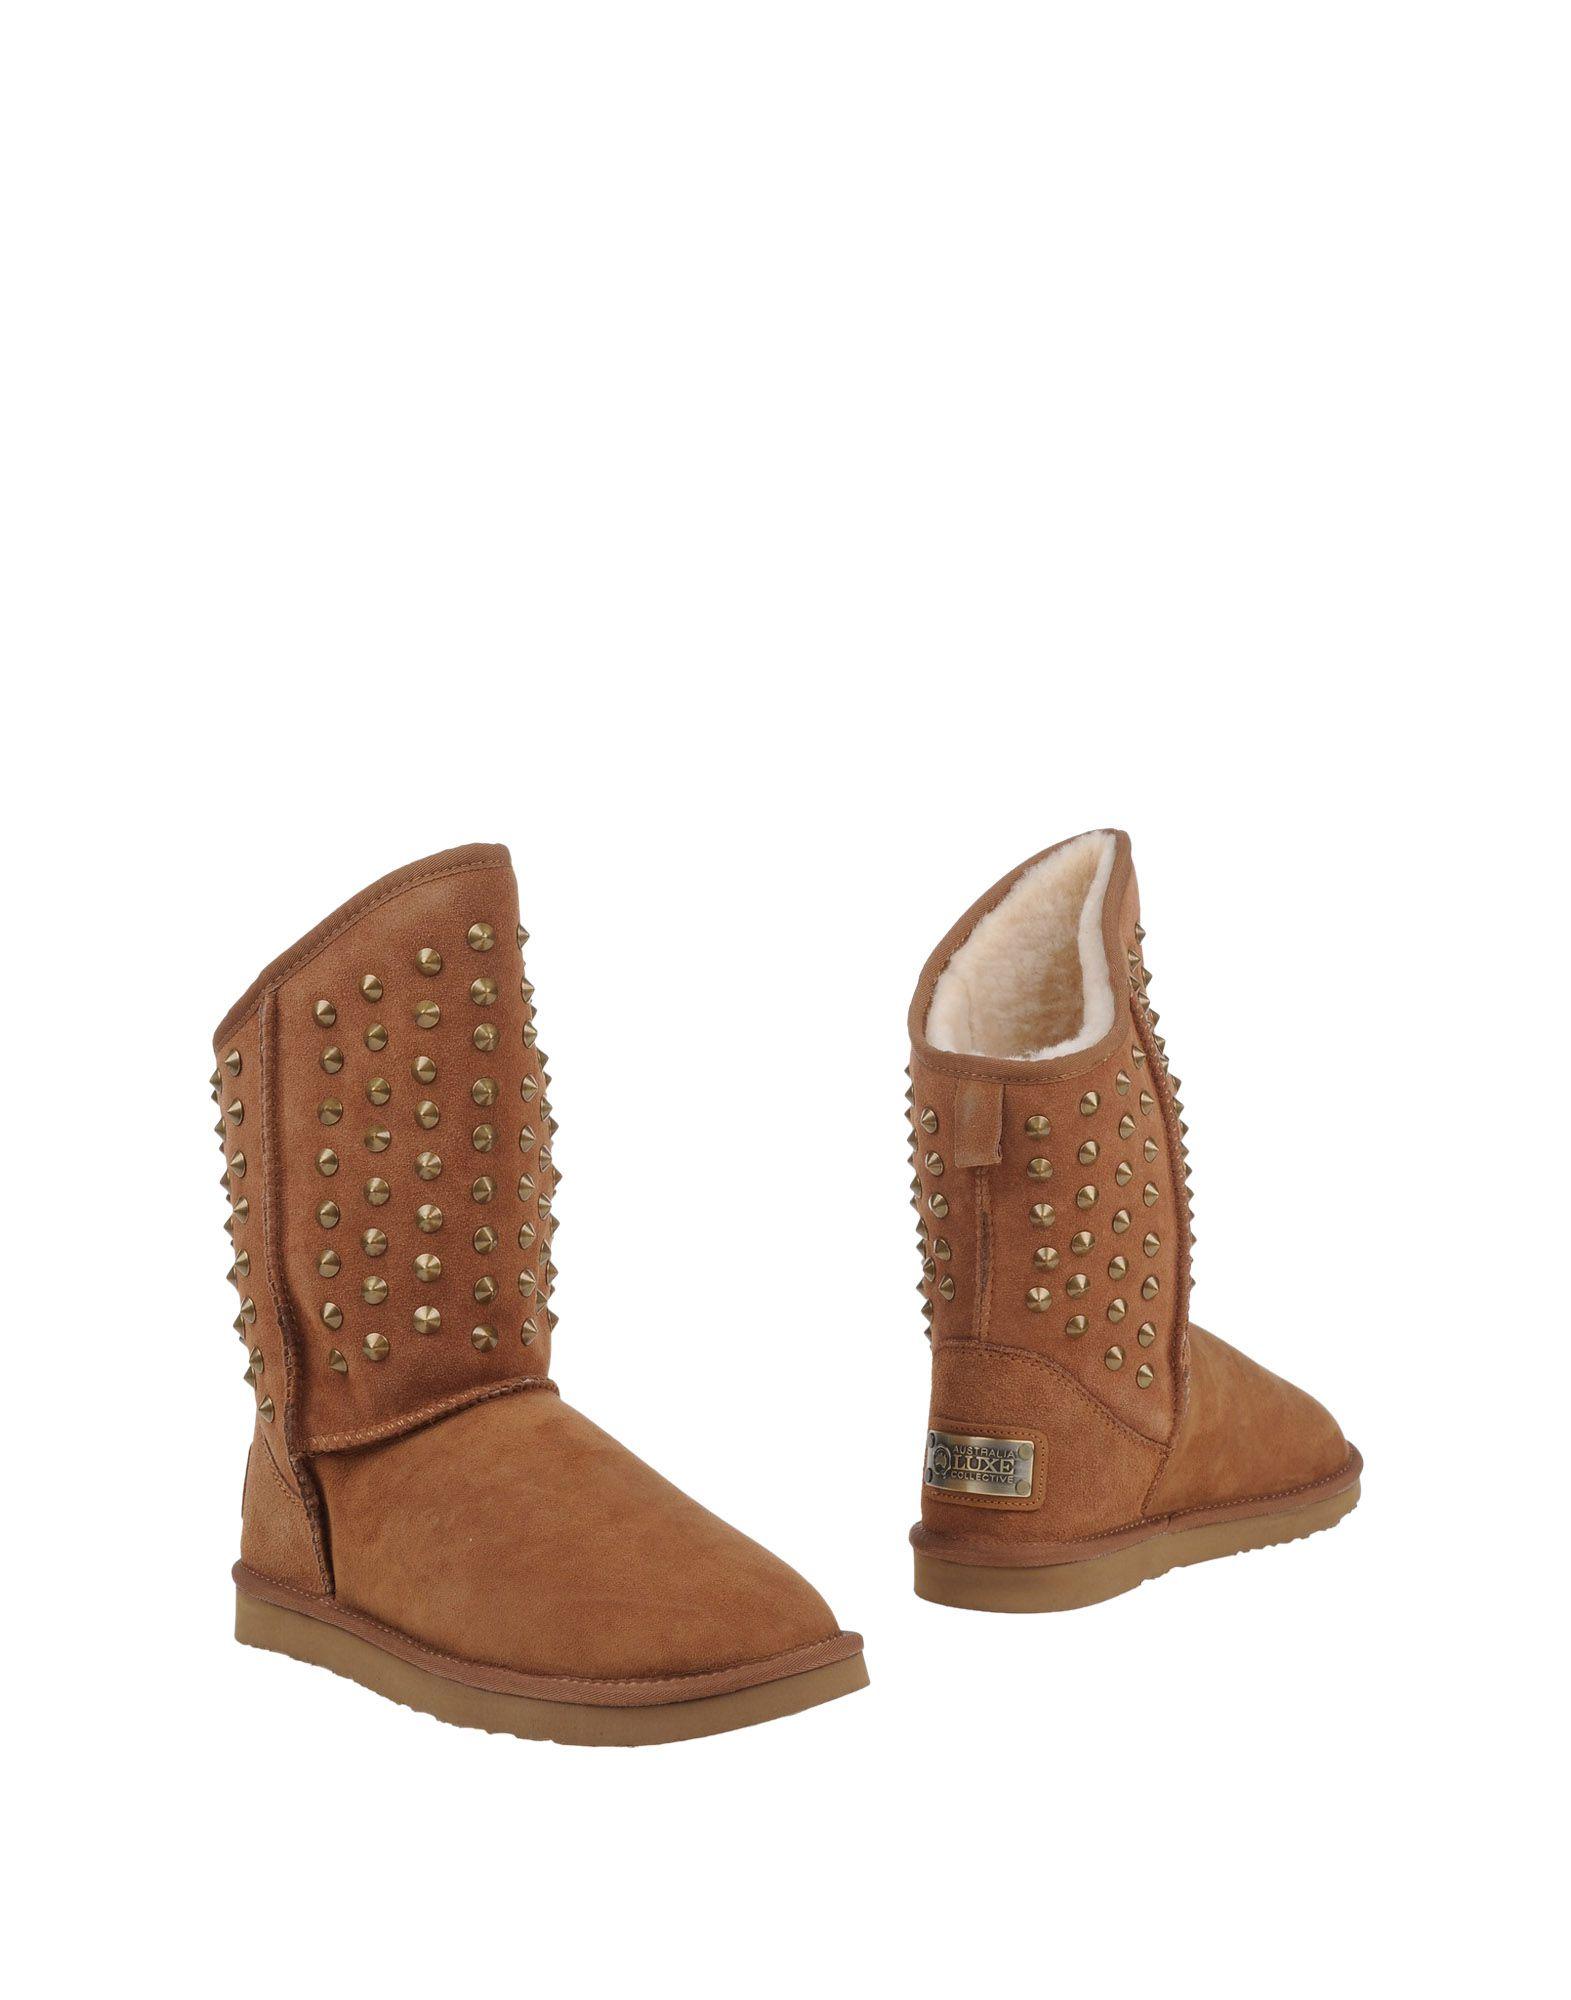 Australia Luxe Collective aussehende Stiefelette Damen  11000603DQGut aussehende Collective strapazierfähige Schuhe 31305c